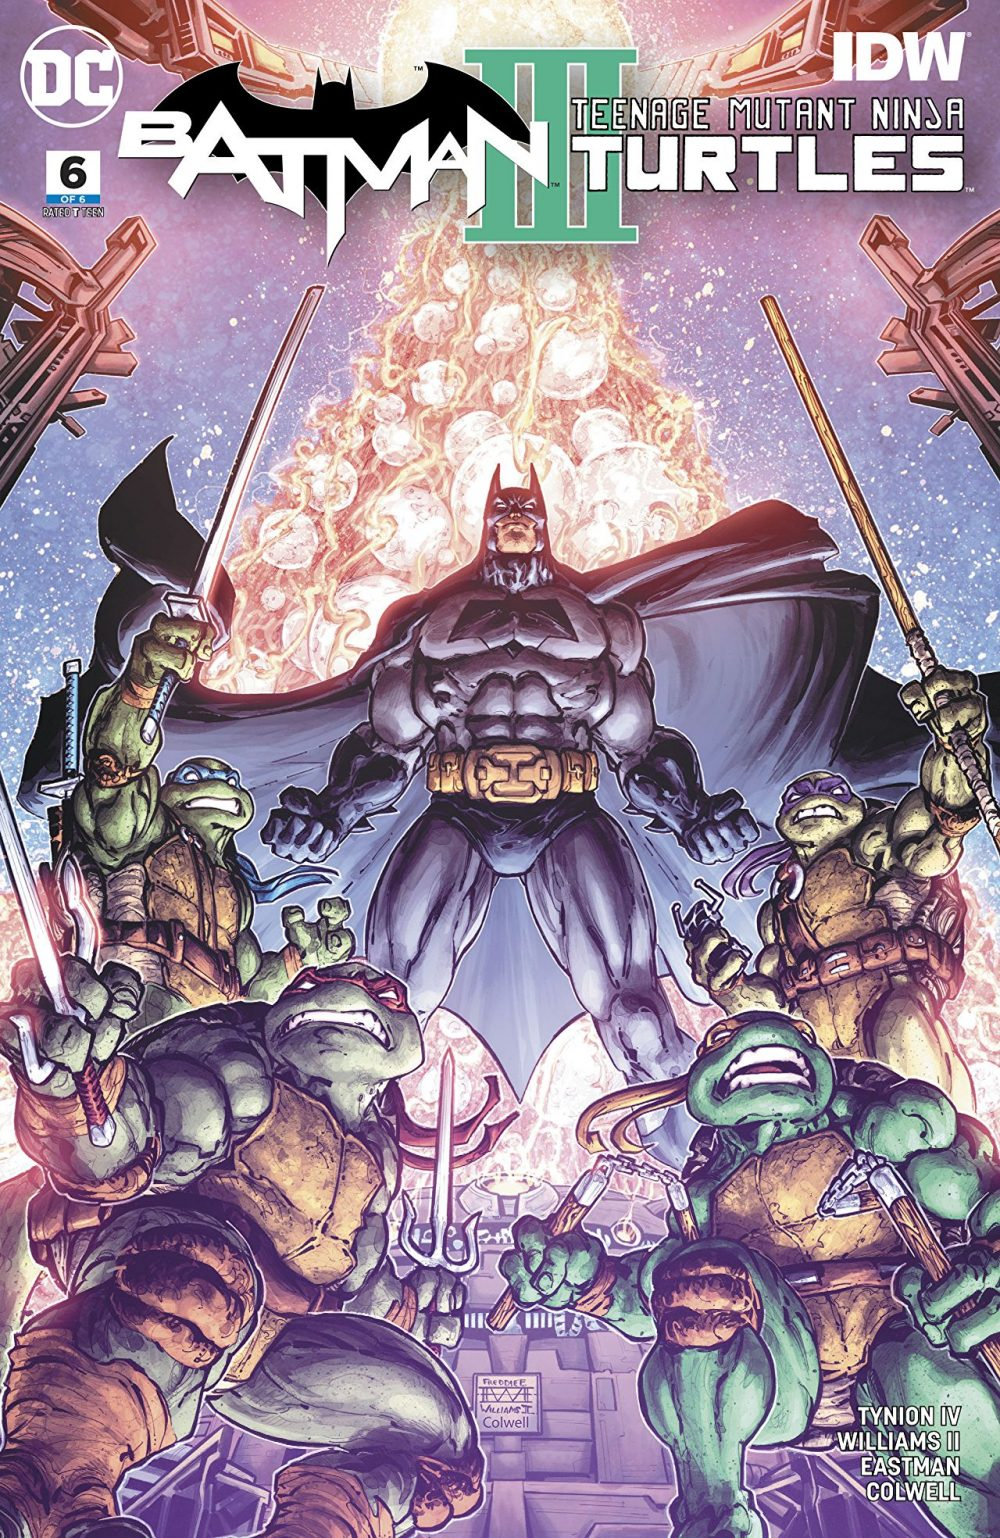 Batman/Teenage Mutant Ninja Turtles III #6, copertina di Freddie Williams II